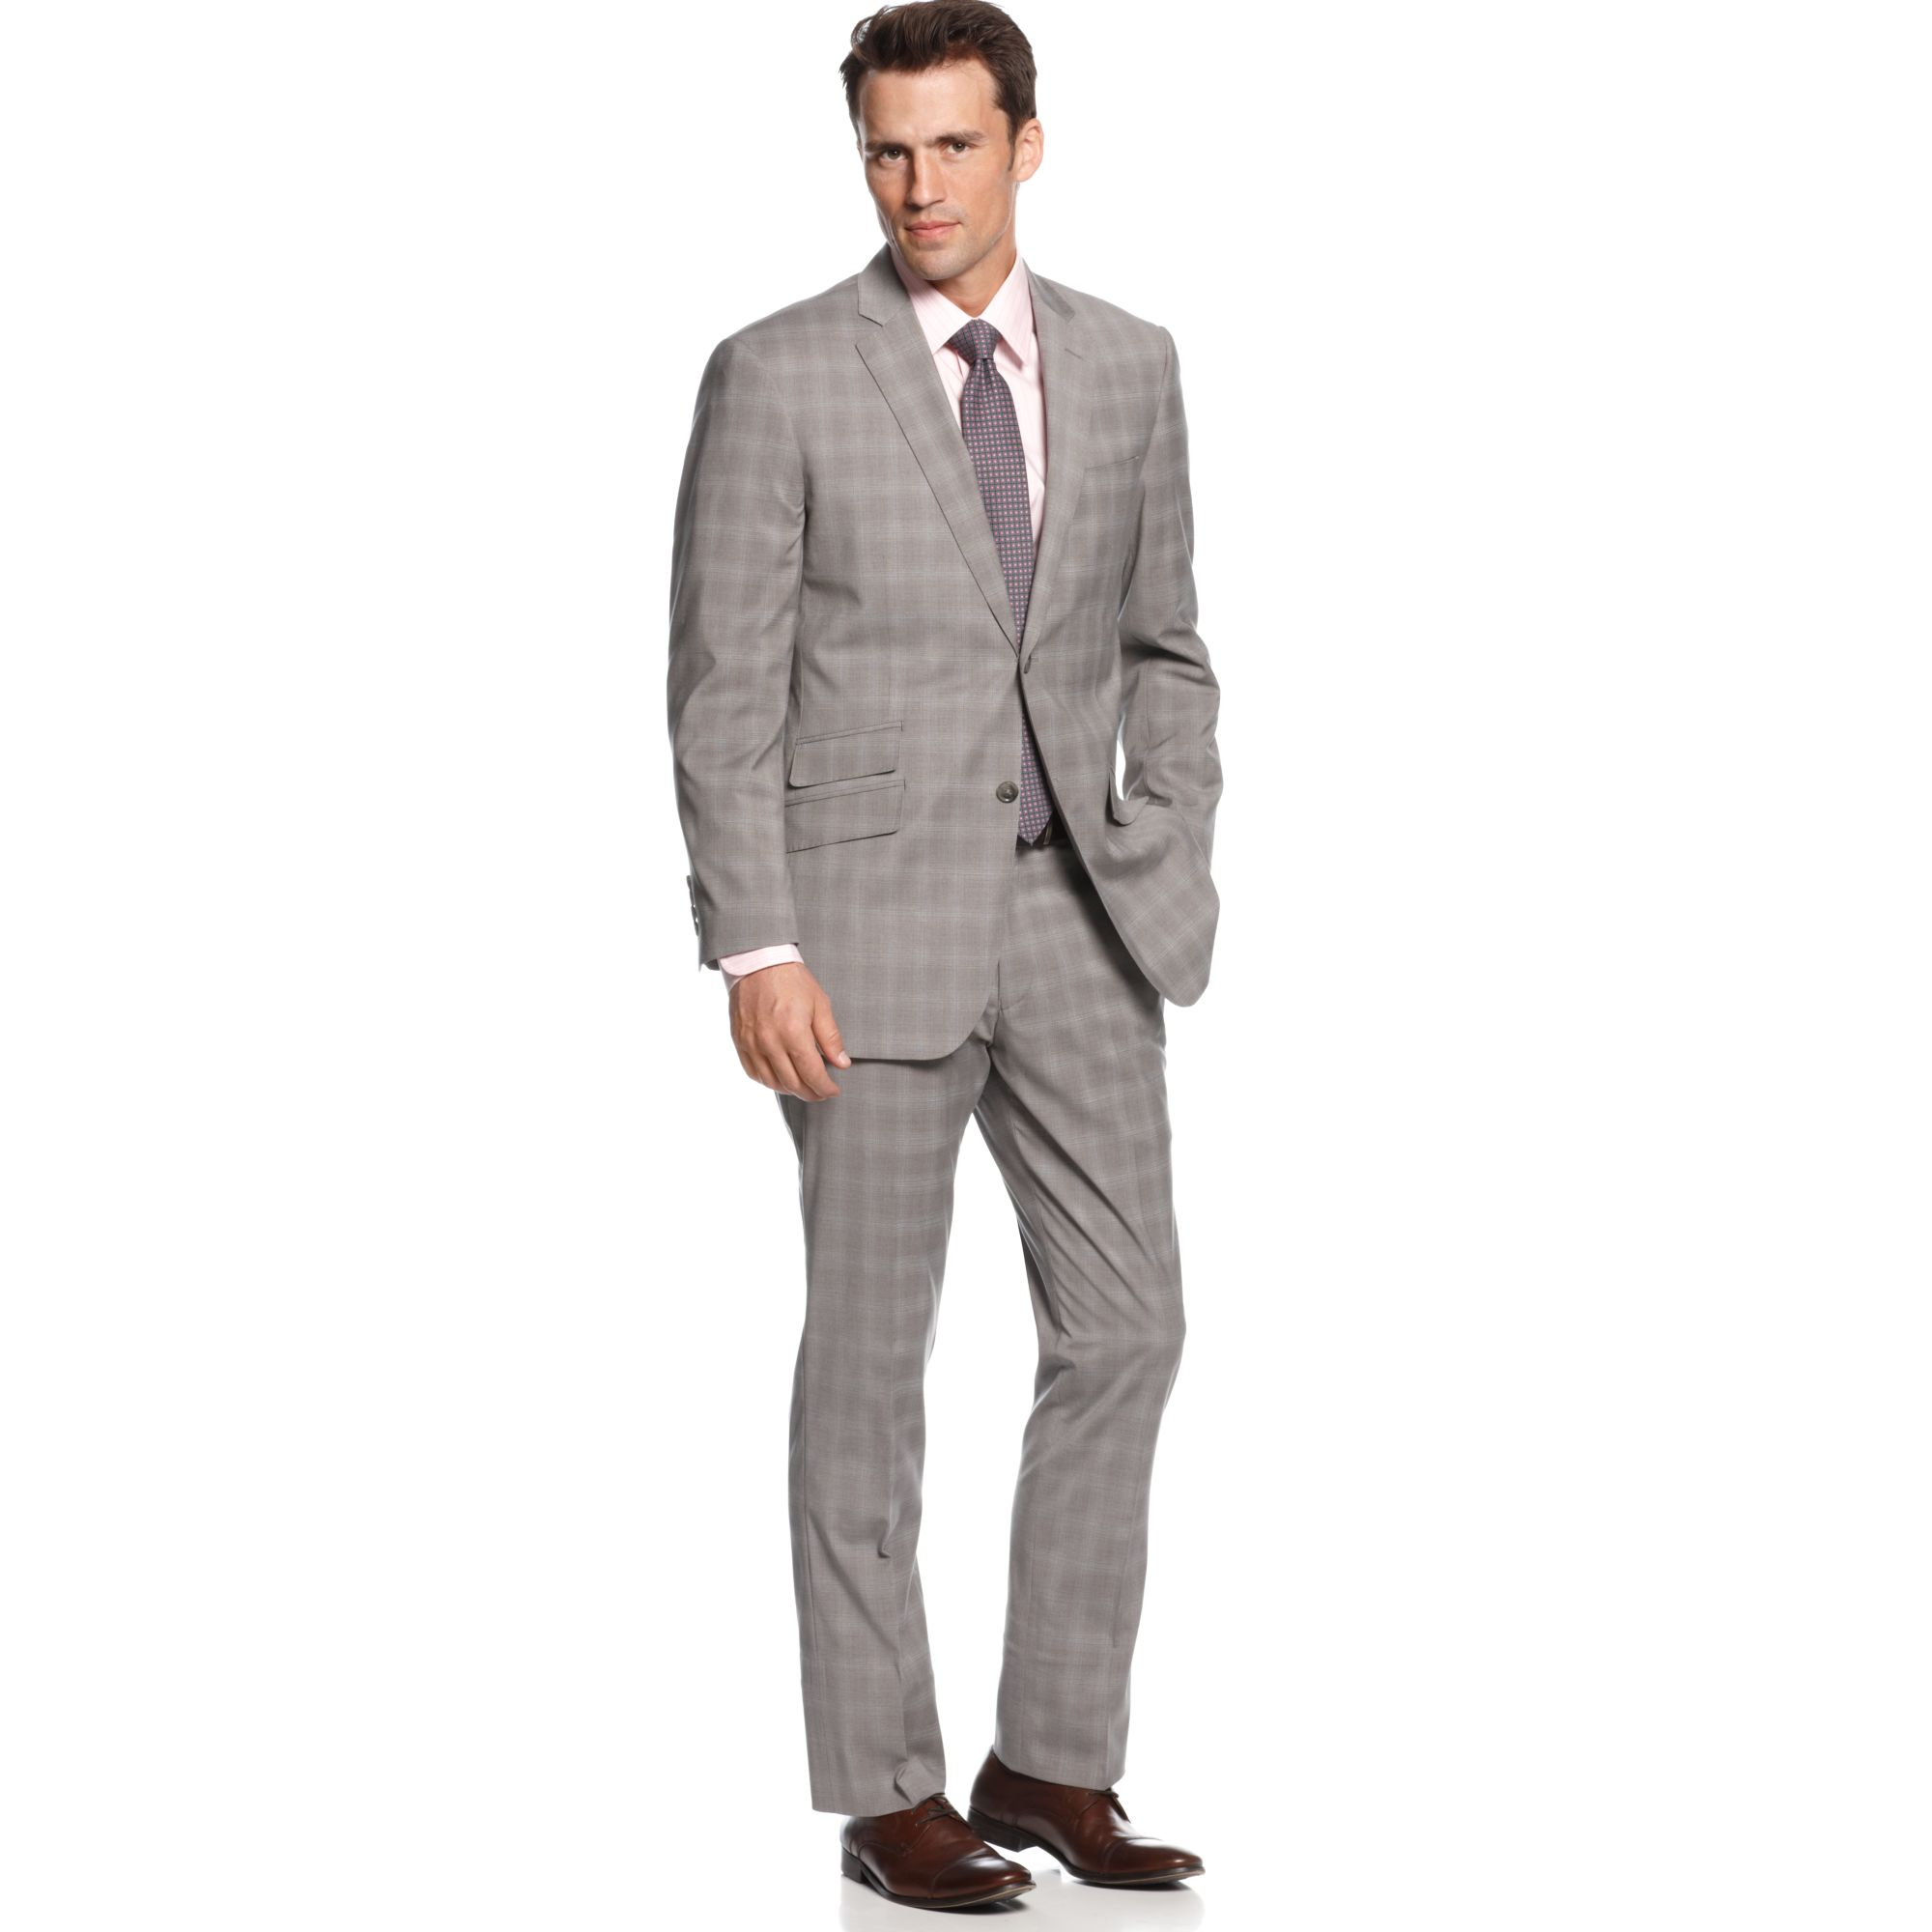 checks suit men indigo dark suits and light ccc en blue awc grey gray